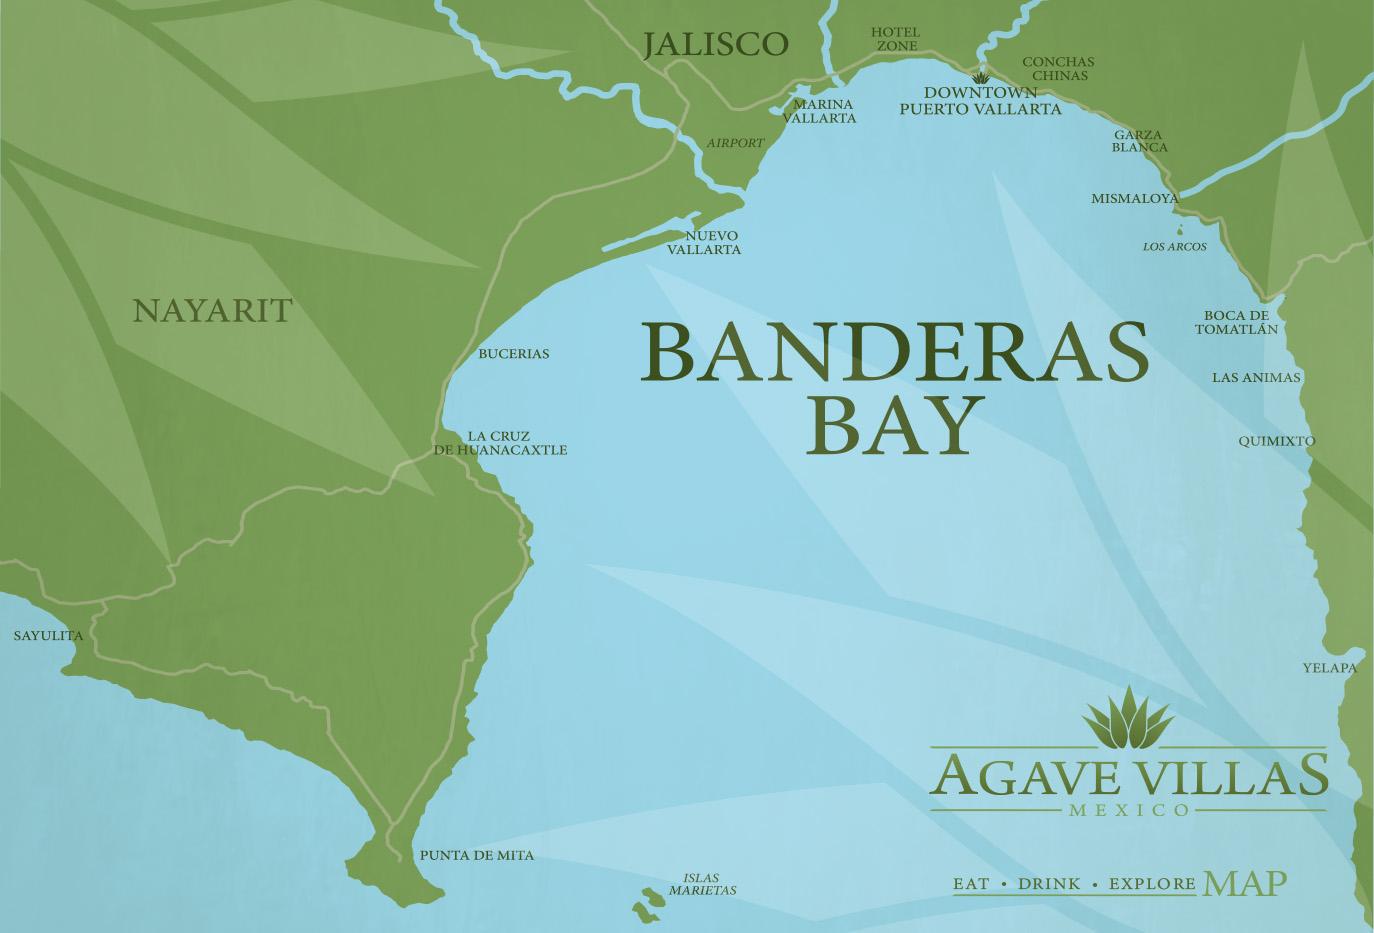 Agave-Villas-Mexico-Custom-Puerto-Vallarta-Banderas-Bay-Sayulita-Punta-Mita-Map-design.jpg